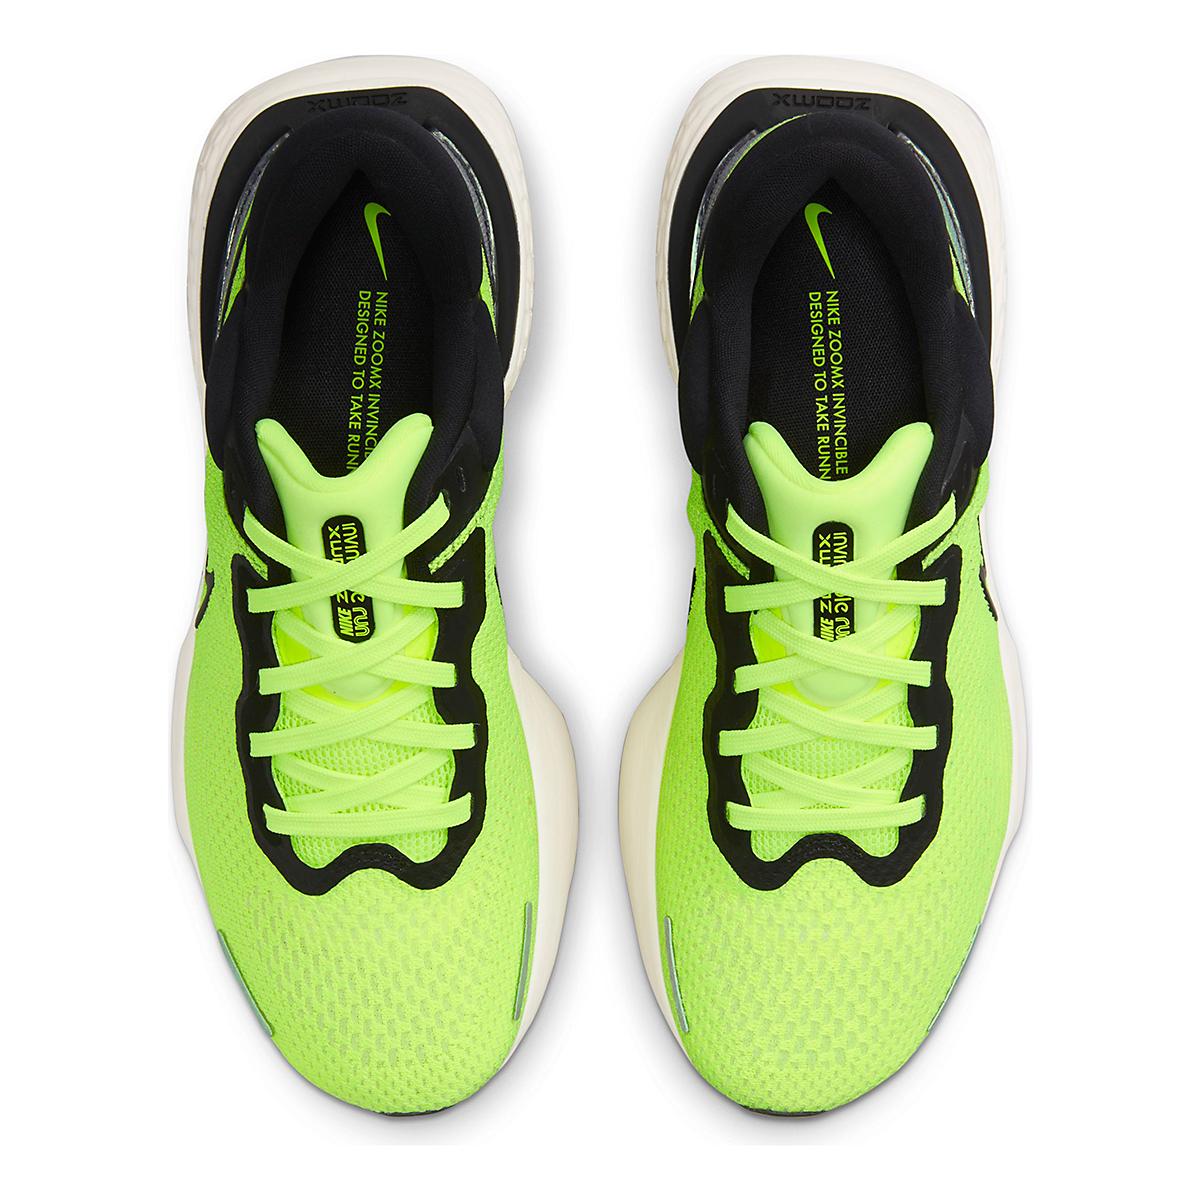 Men's Nike Zoomx Invincible Run FlyKnit Running Shoe - Color: Volt/Black/Barely Volt - Size: 6 - Width: Regular, Volt/Black/Barely Volt, large, image 4